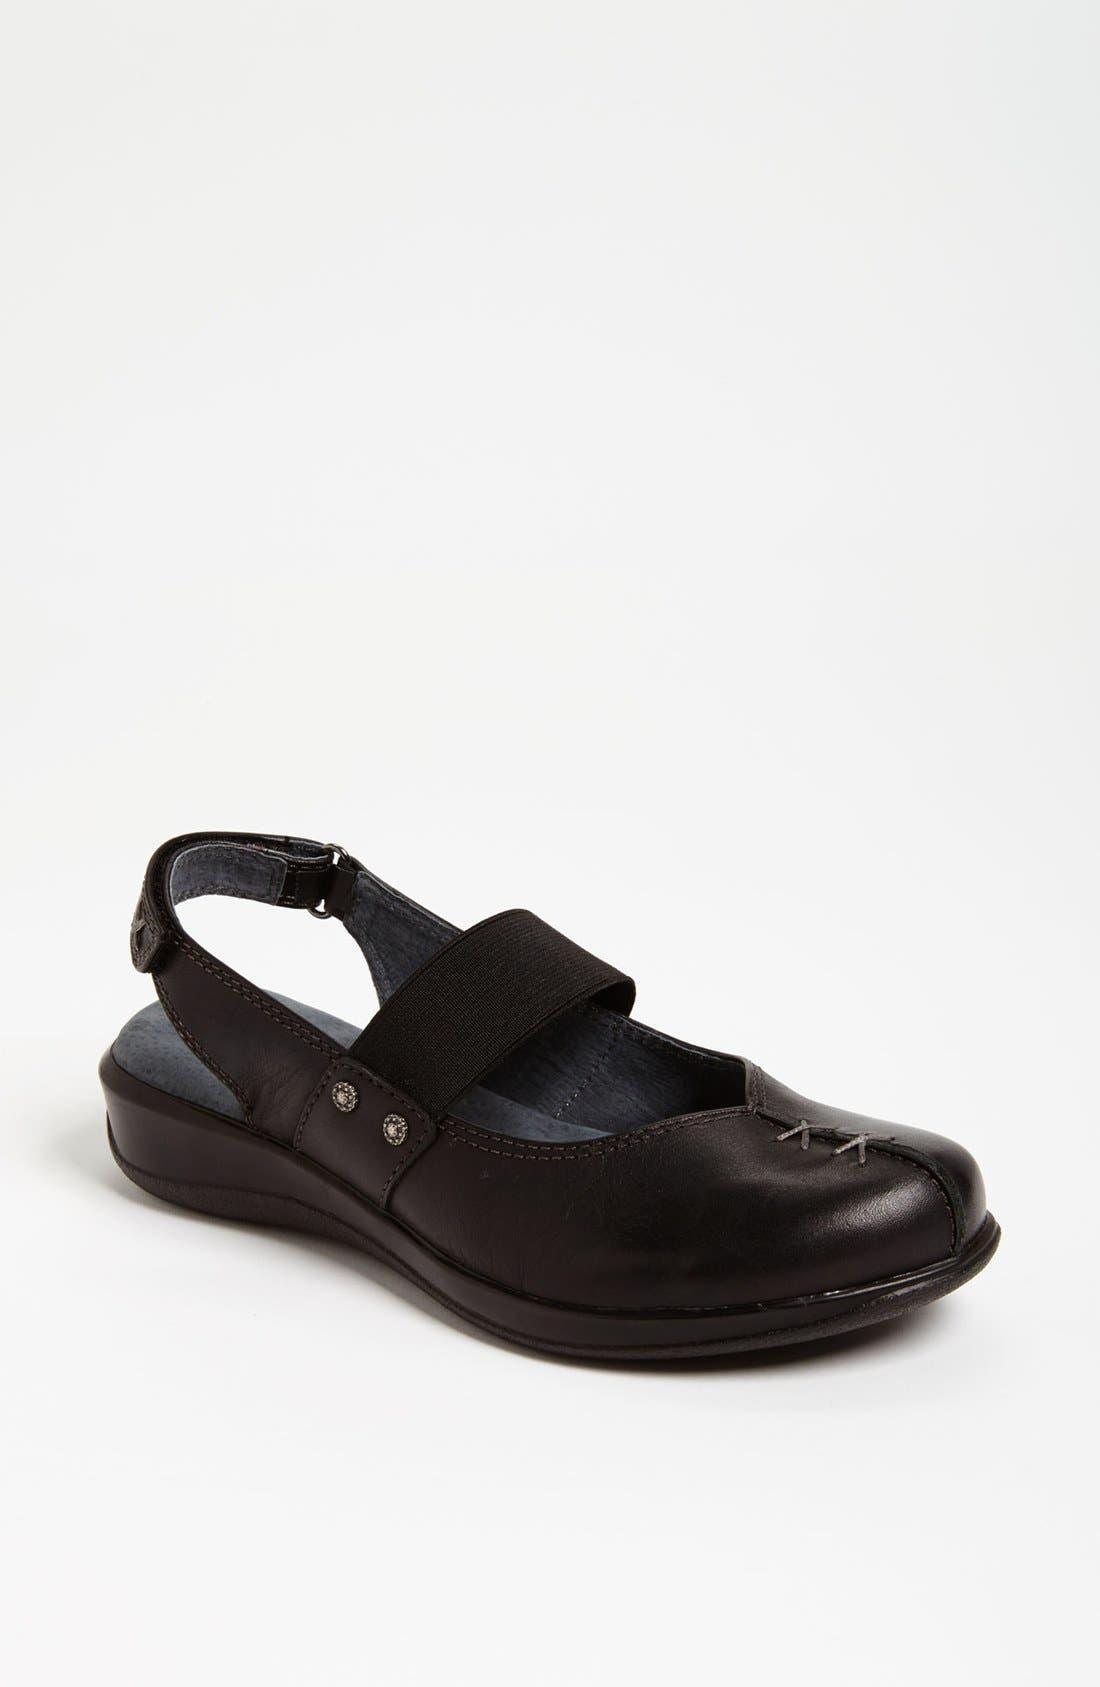 Alternate Image 1 Selected - SoftWalk® 'Tomale' Sandal